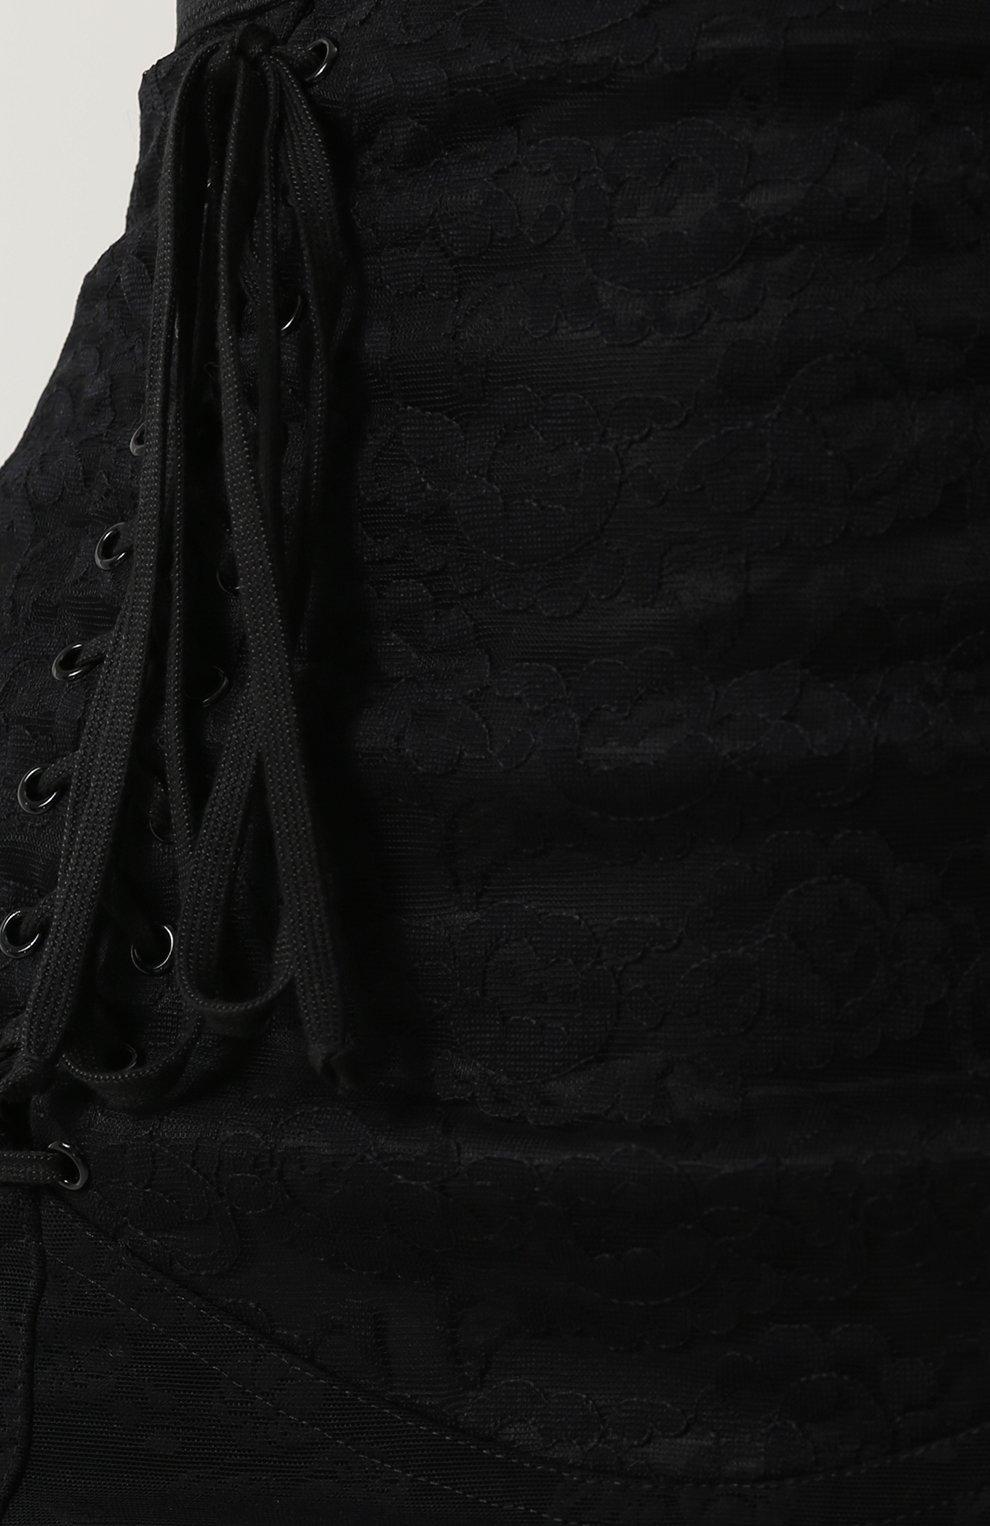 Кружевная юбка-карандаш со шнуровкой Dolce & Gabbana черная | Фото №5